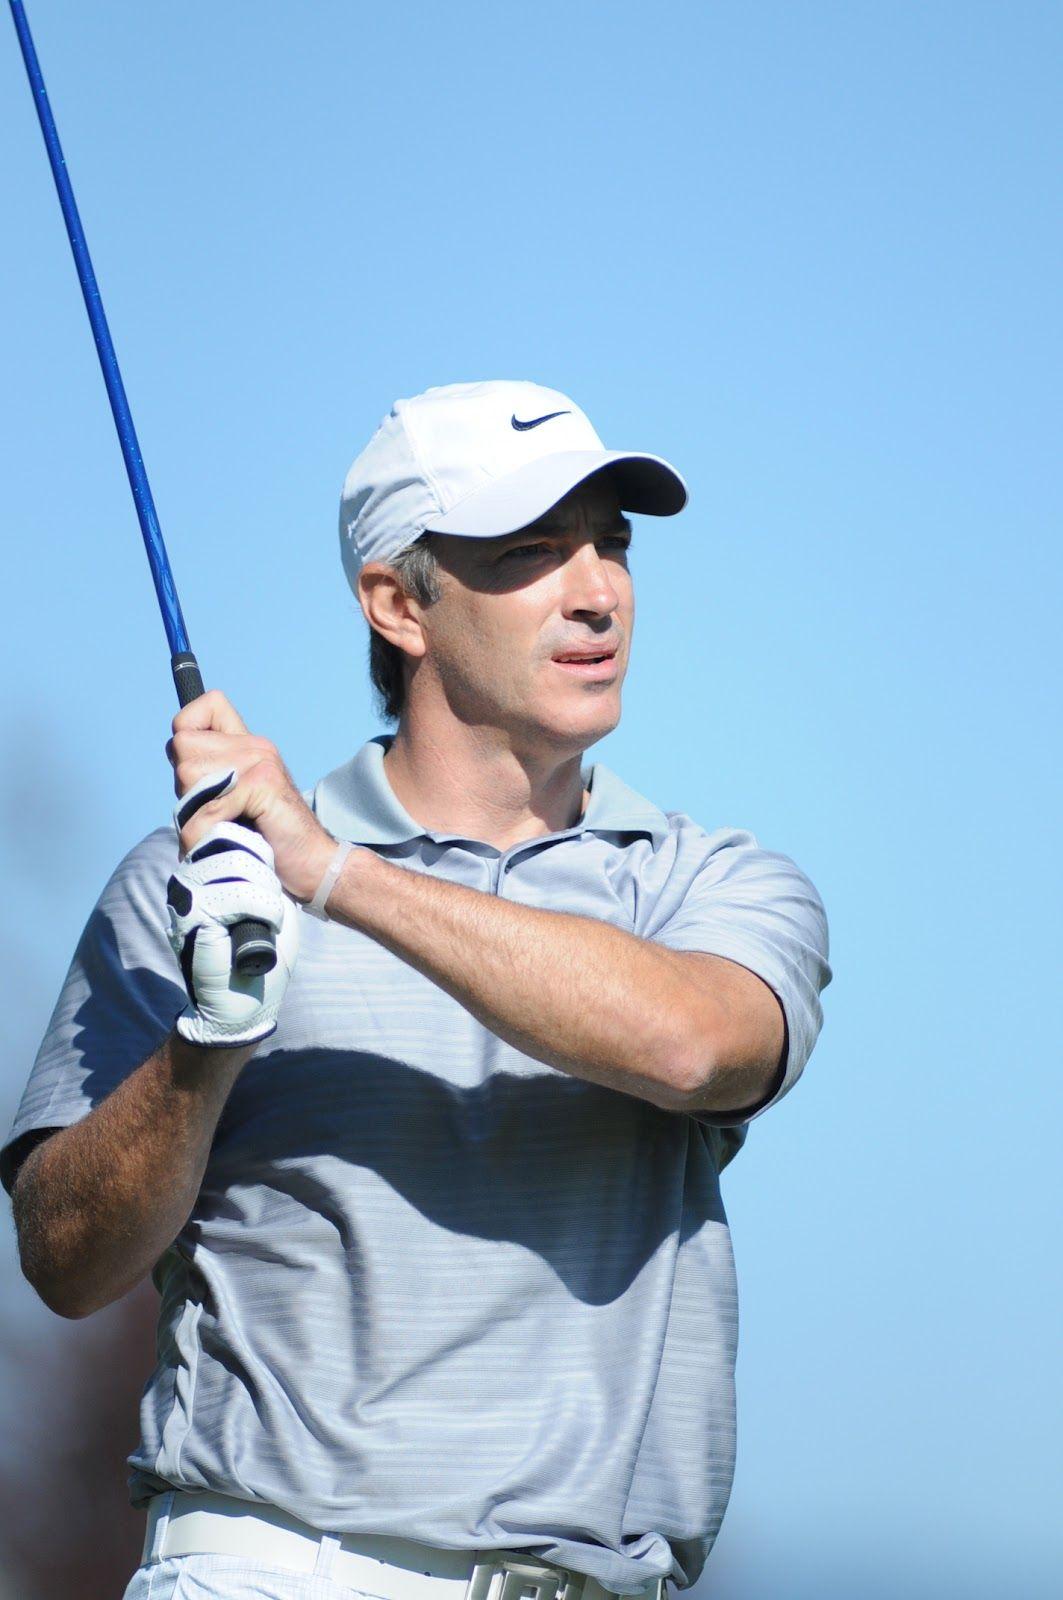 Joe sakic play golf players